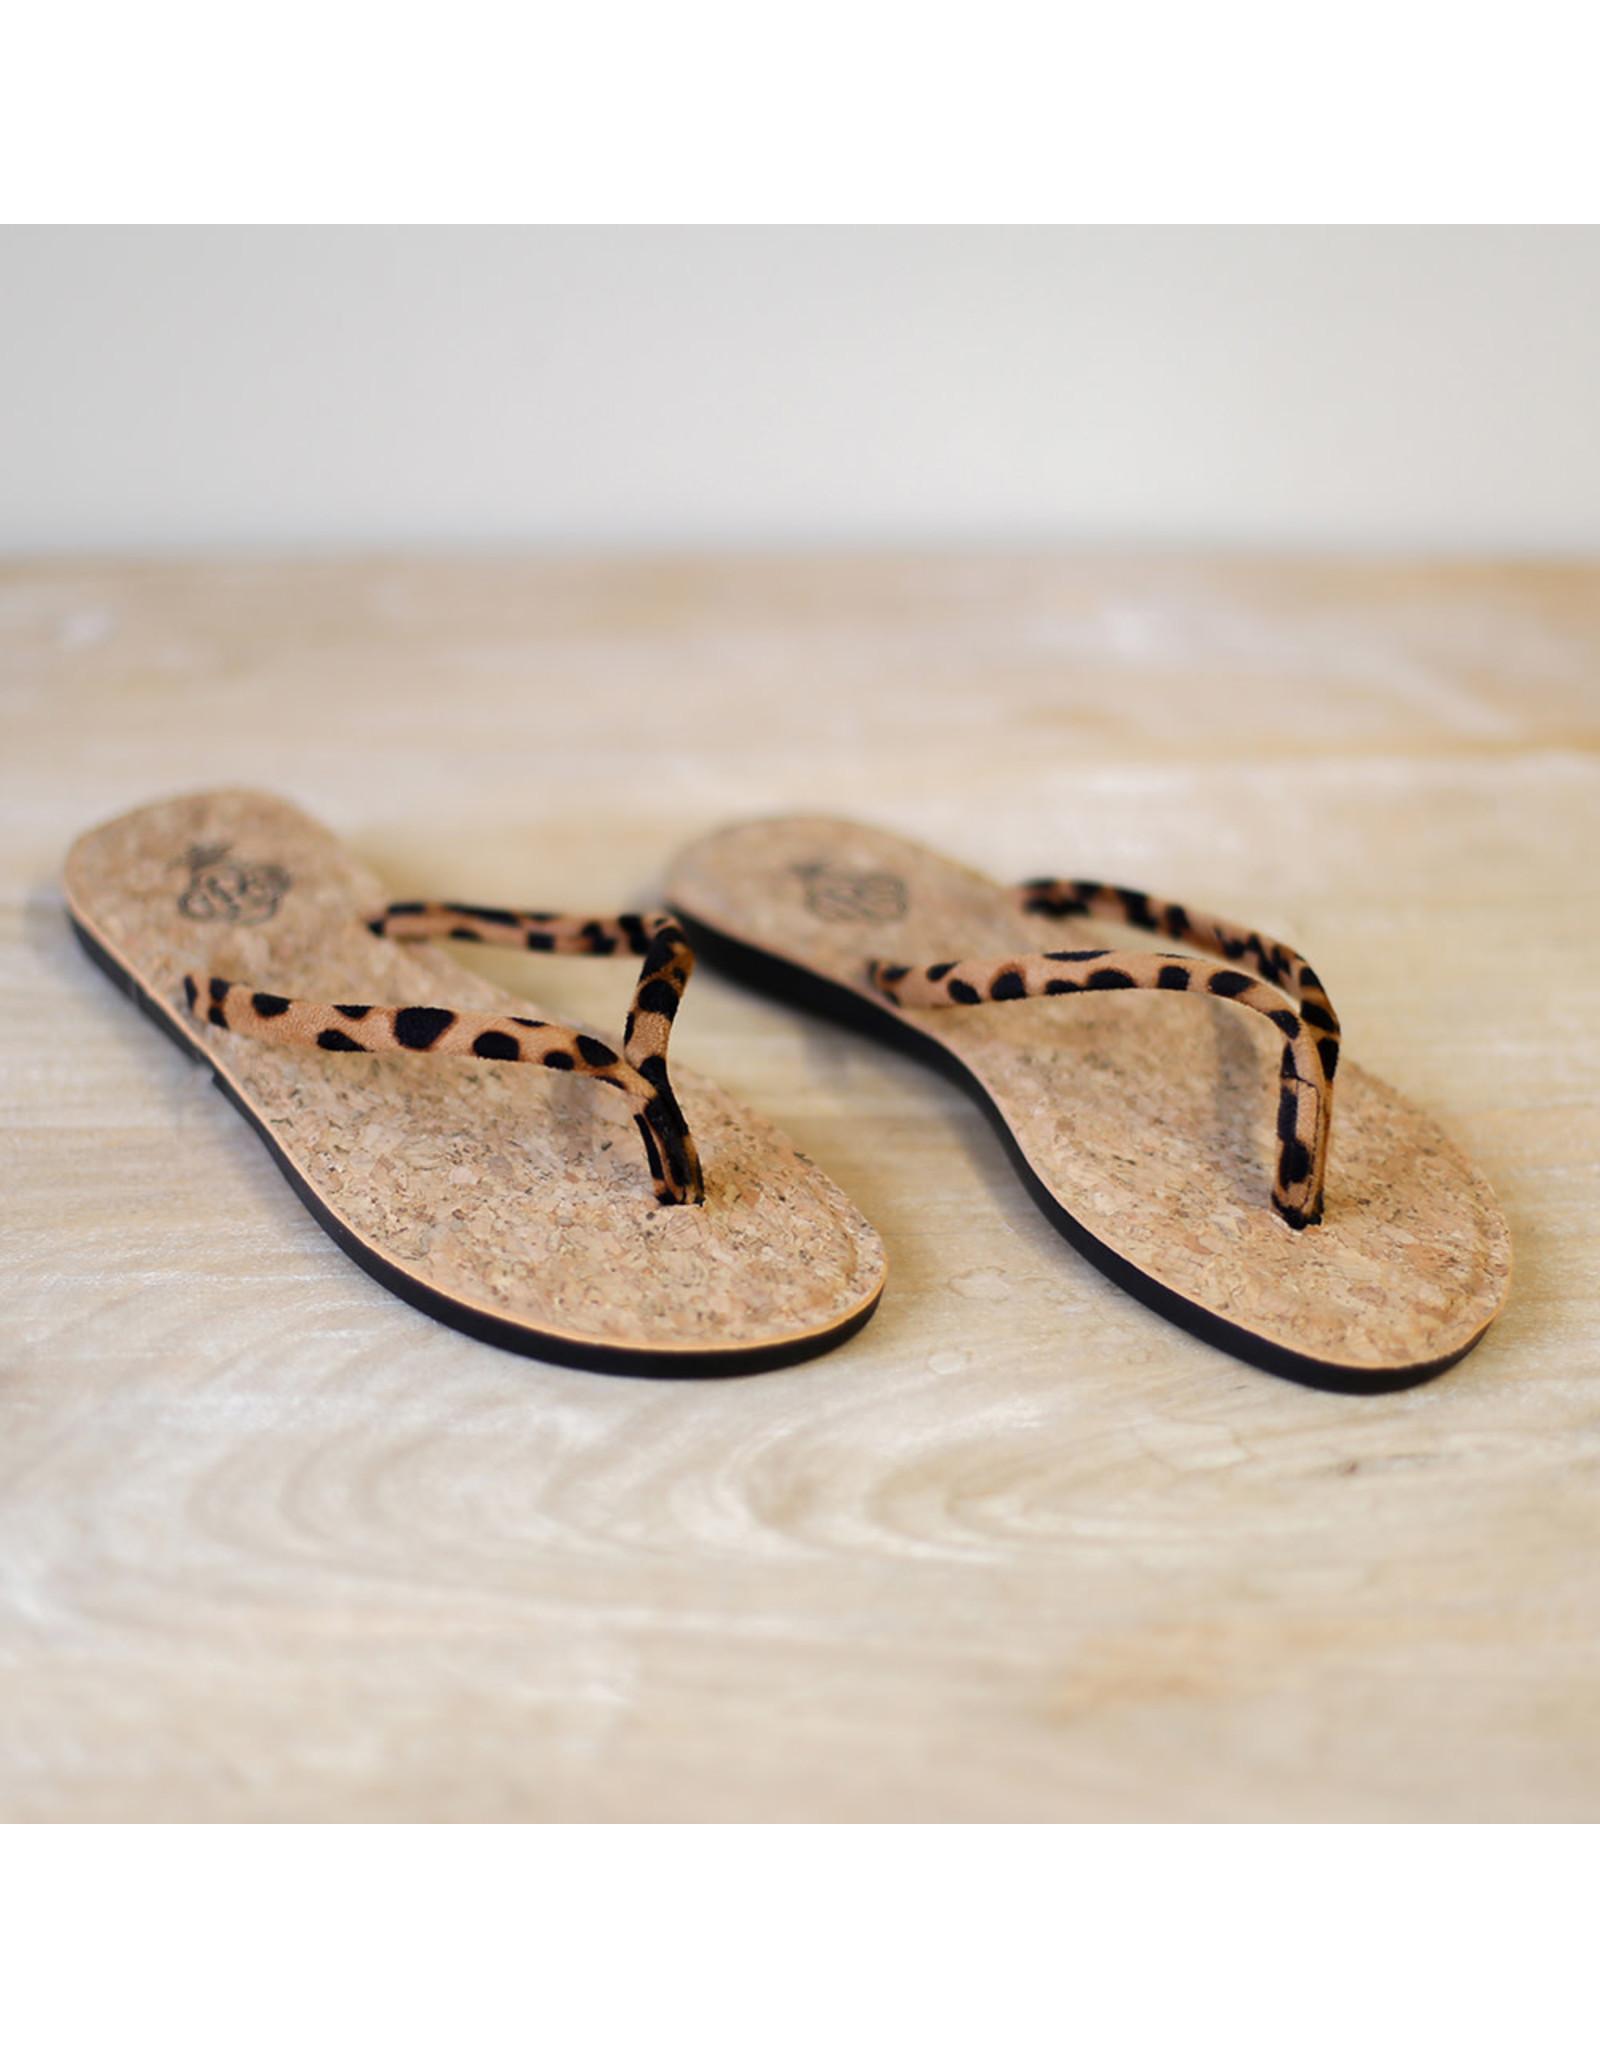 The Ritzy Gypsy CHARLEY Leopard Flip Flop